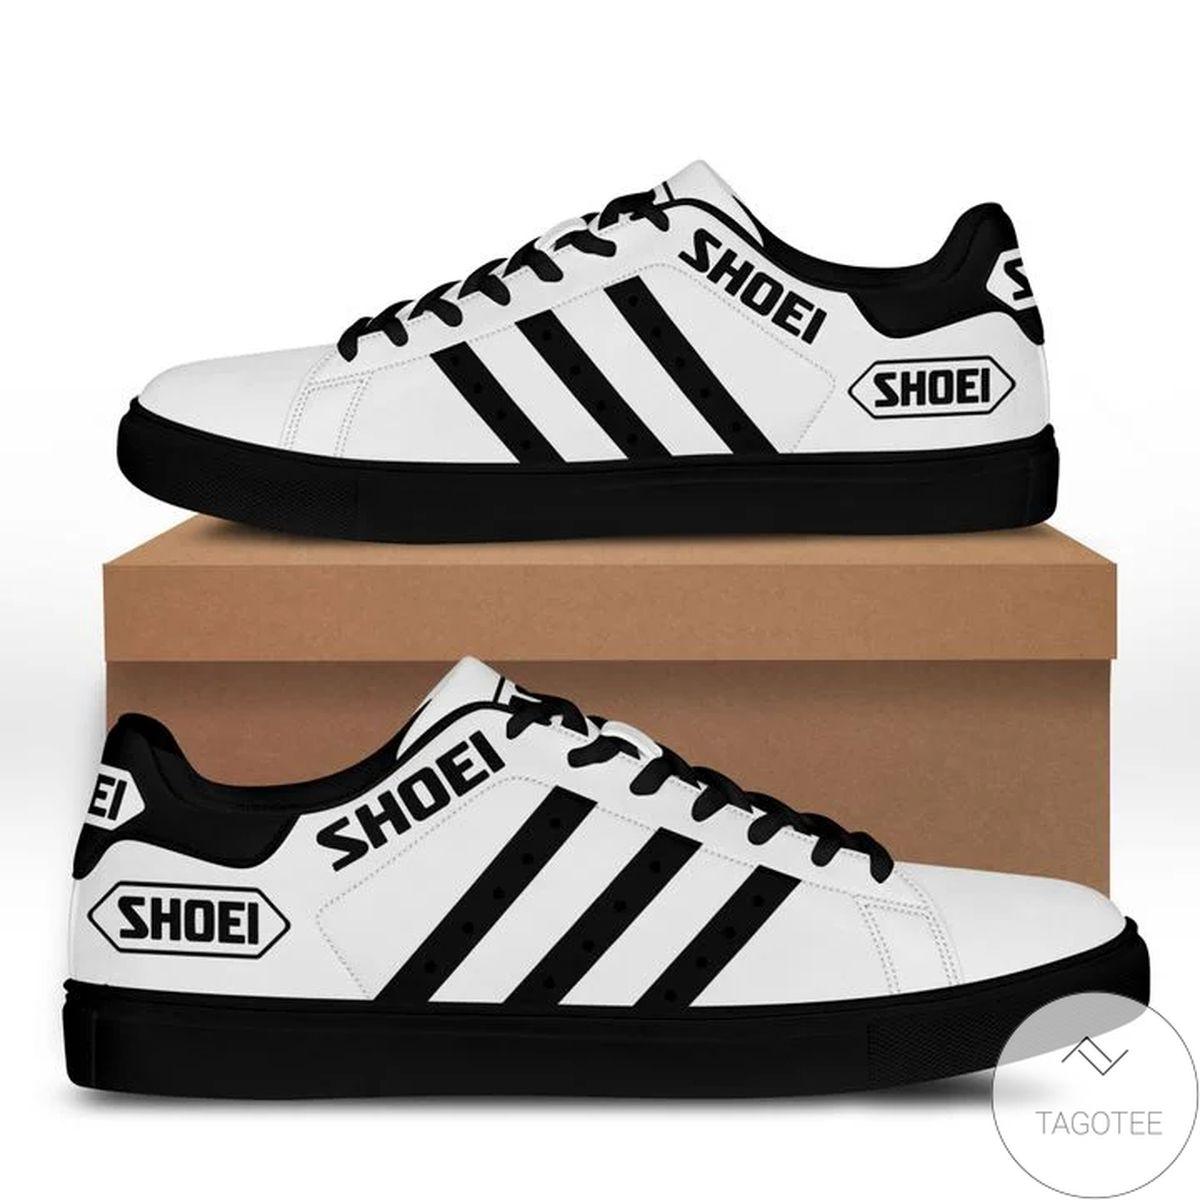 Shoei Stan Smith Shoes